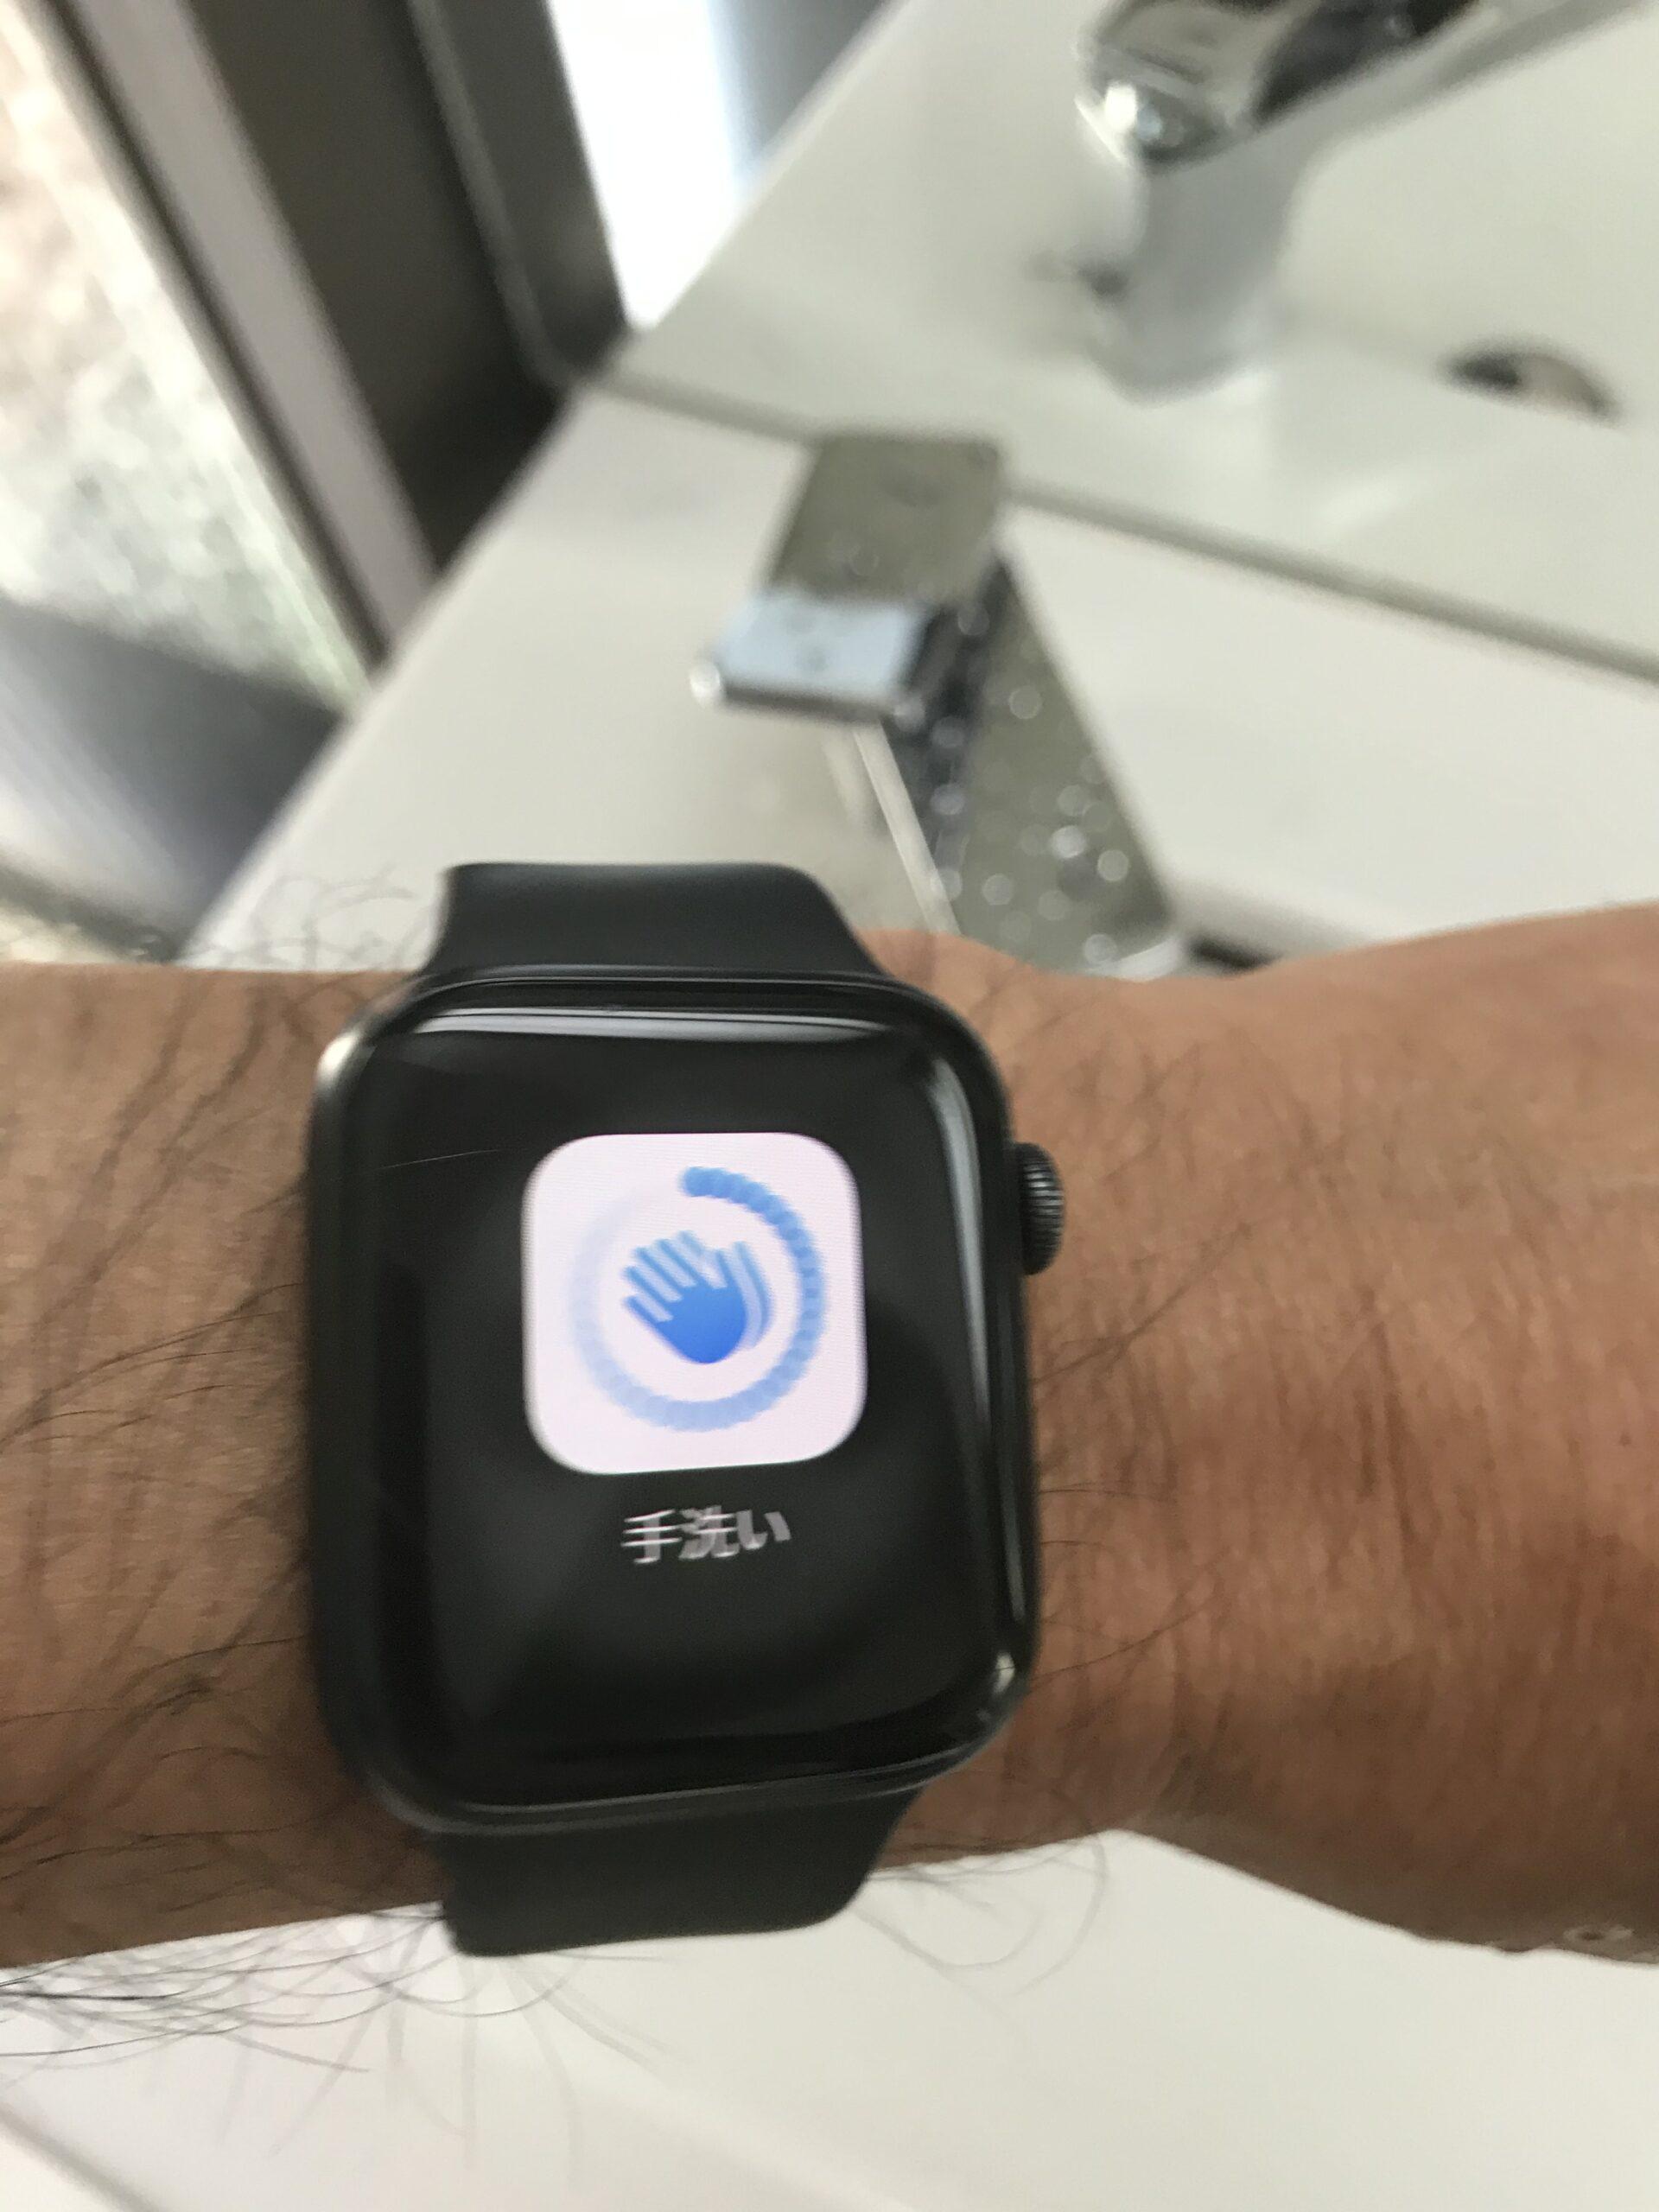 Apple watchの手洗いタイマー